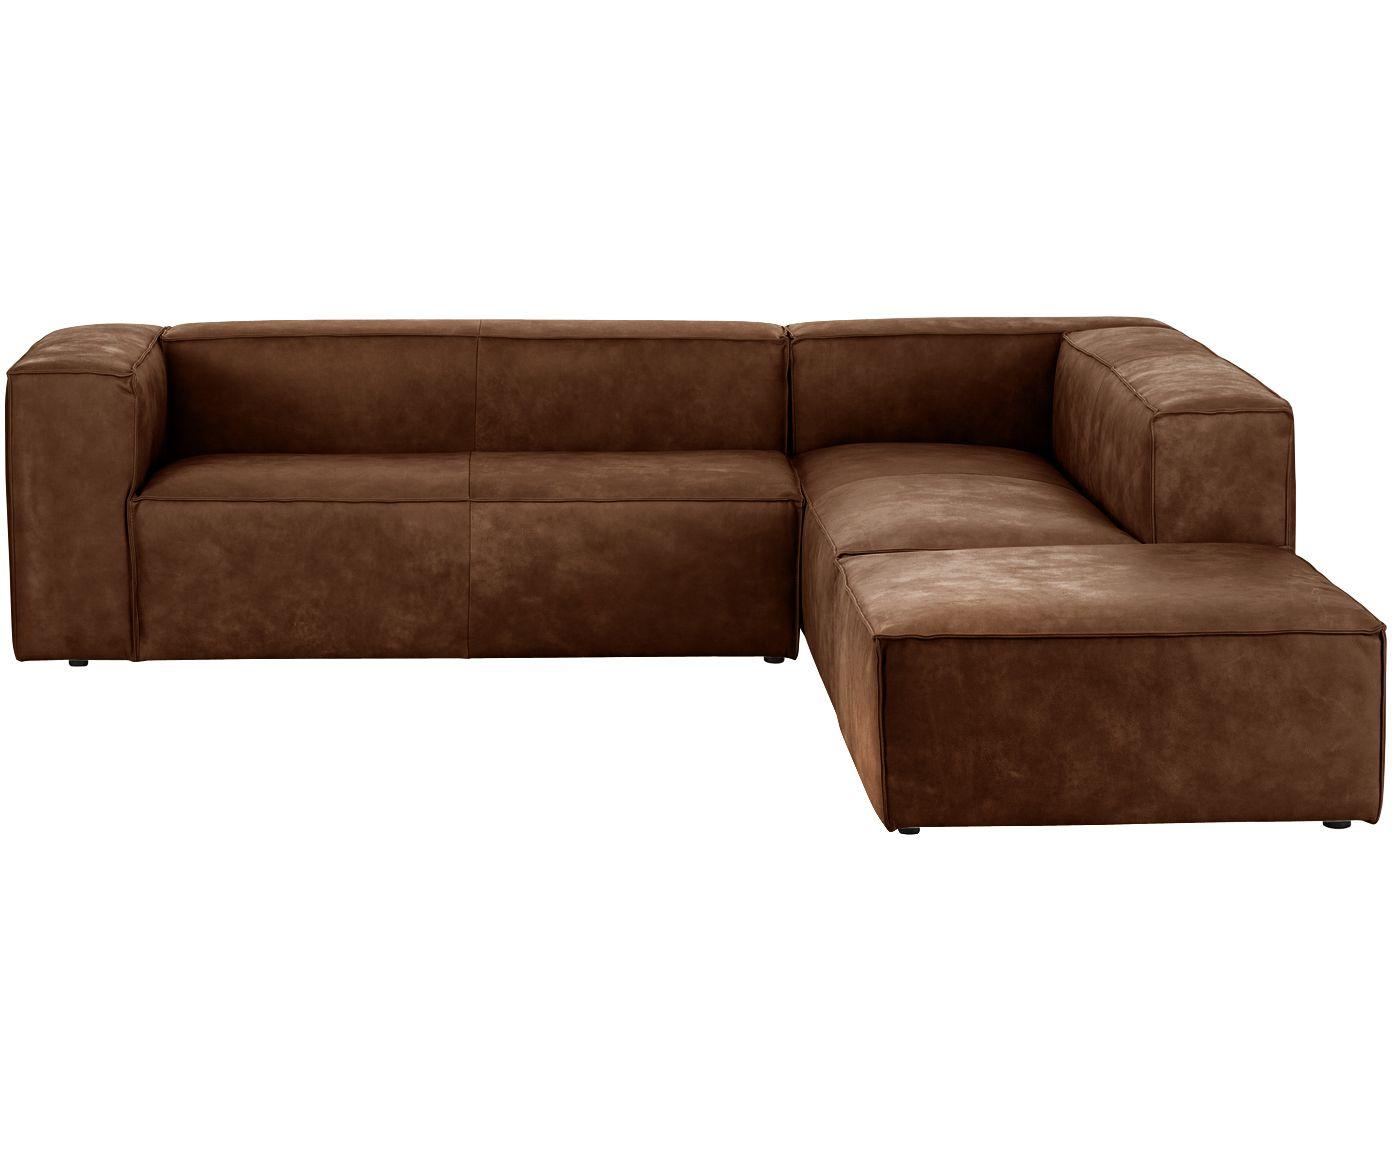 Leder Sofa-Set Summer, 3-tlg | Pinterest | Sofa set